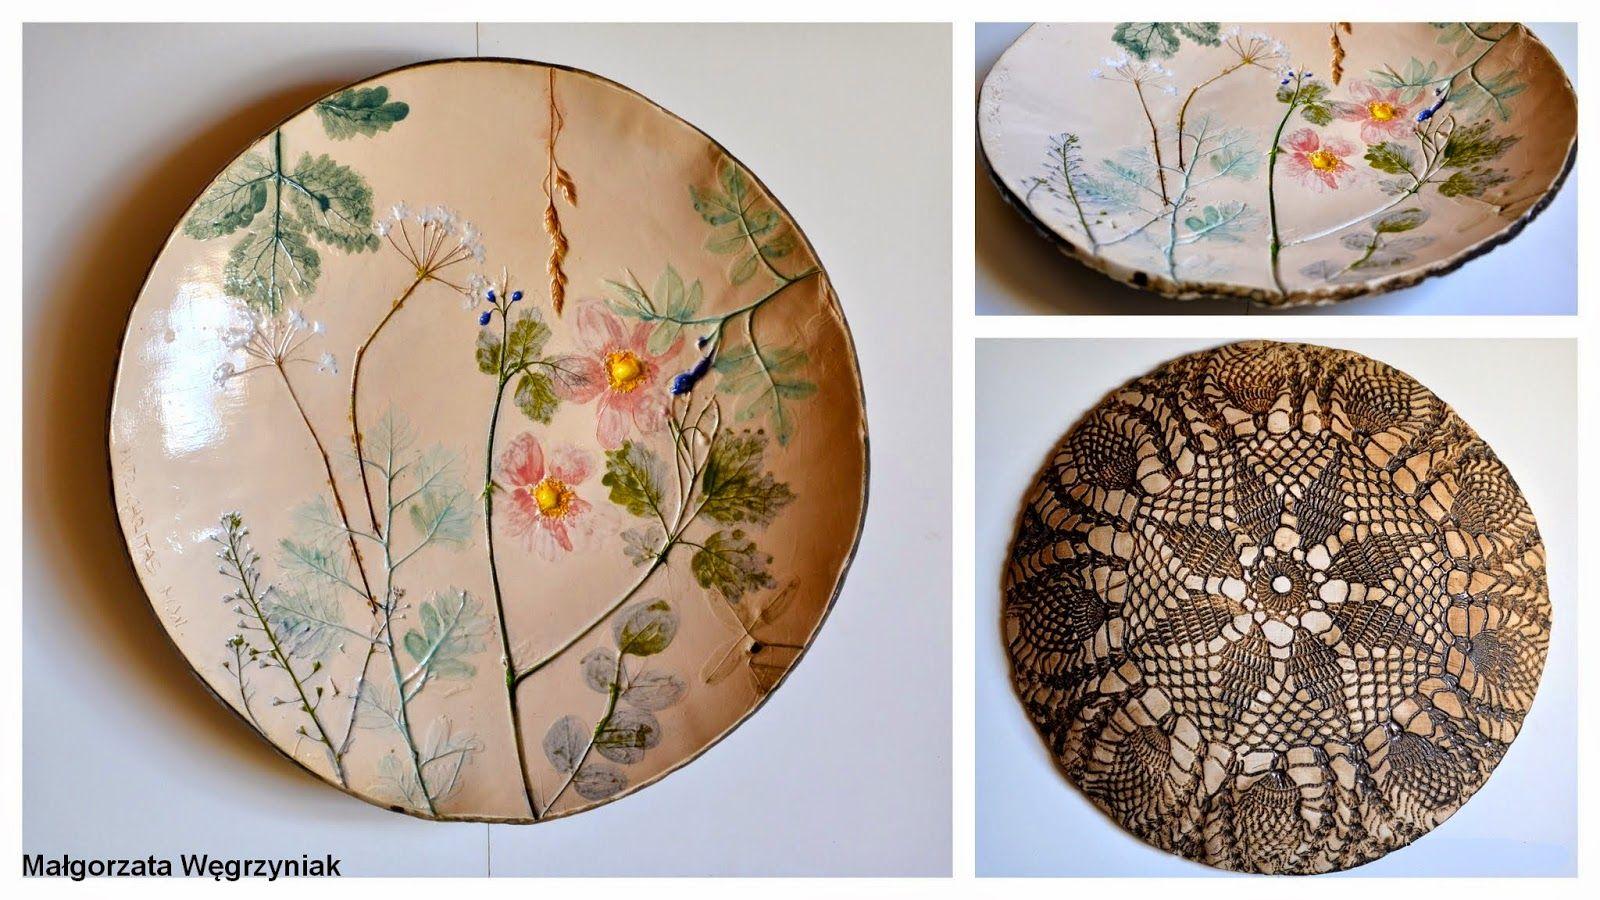 Talerz roślinny polandhandmade.pl, #polandhandmade #ceramic